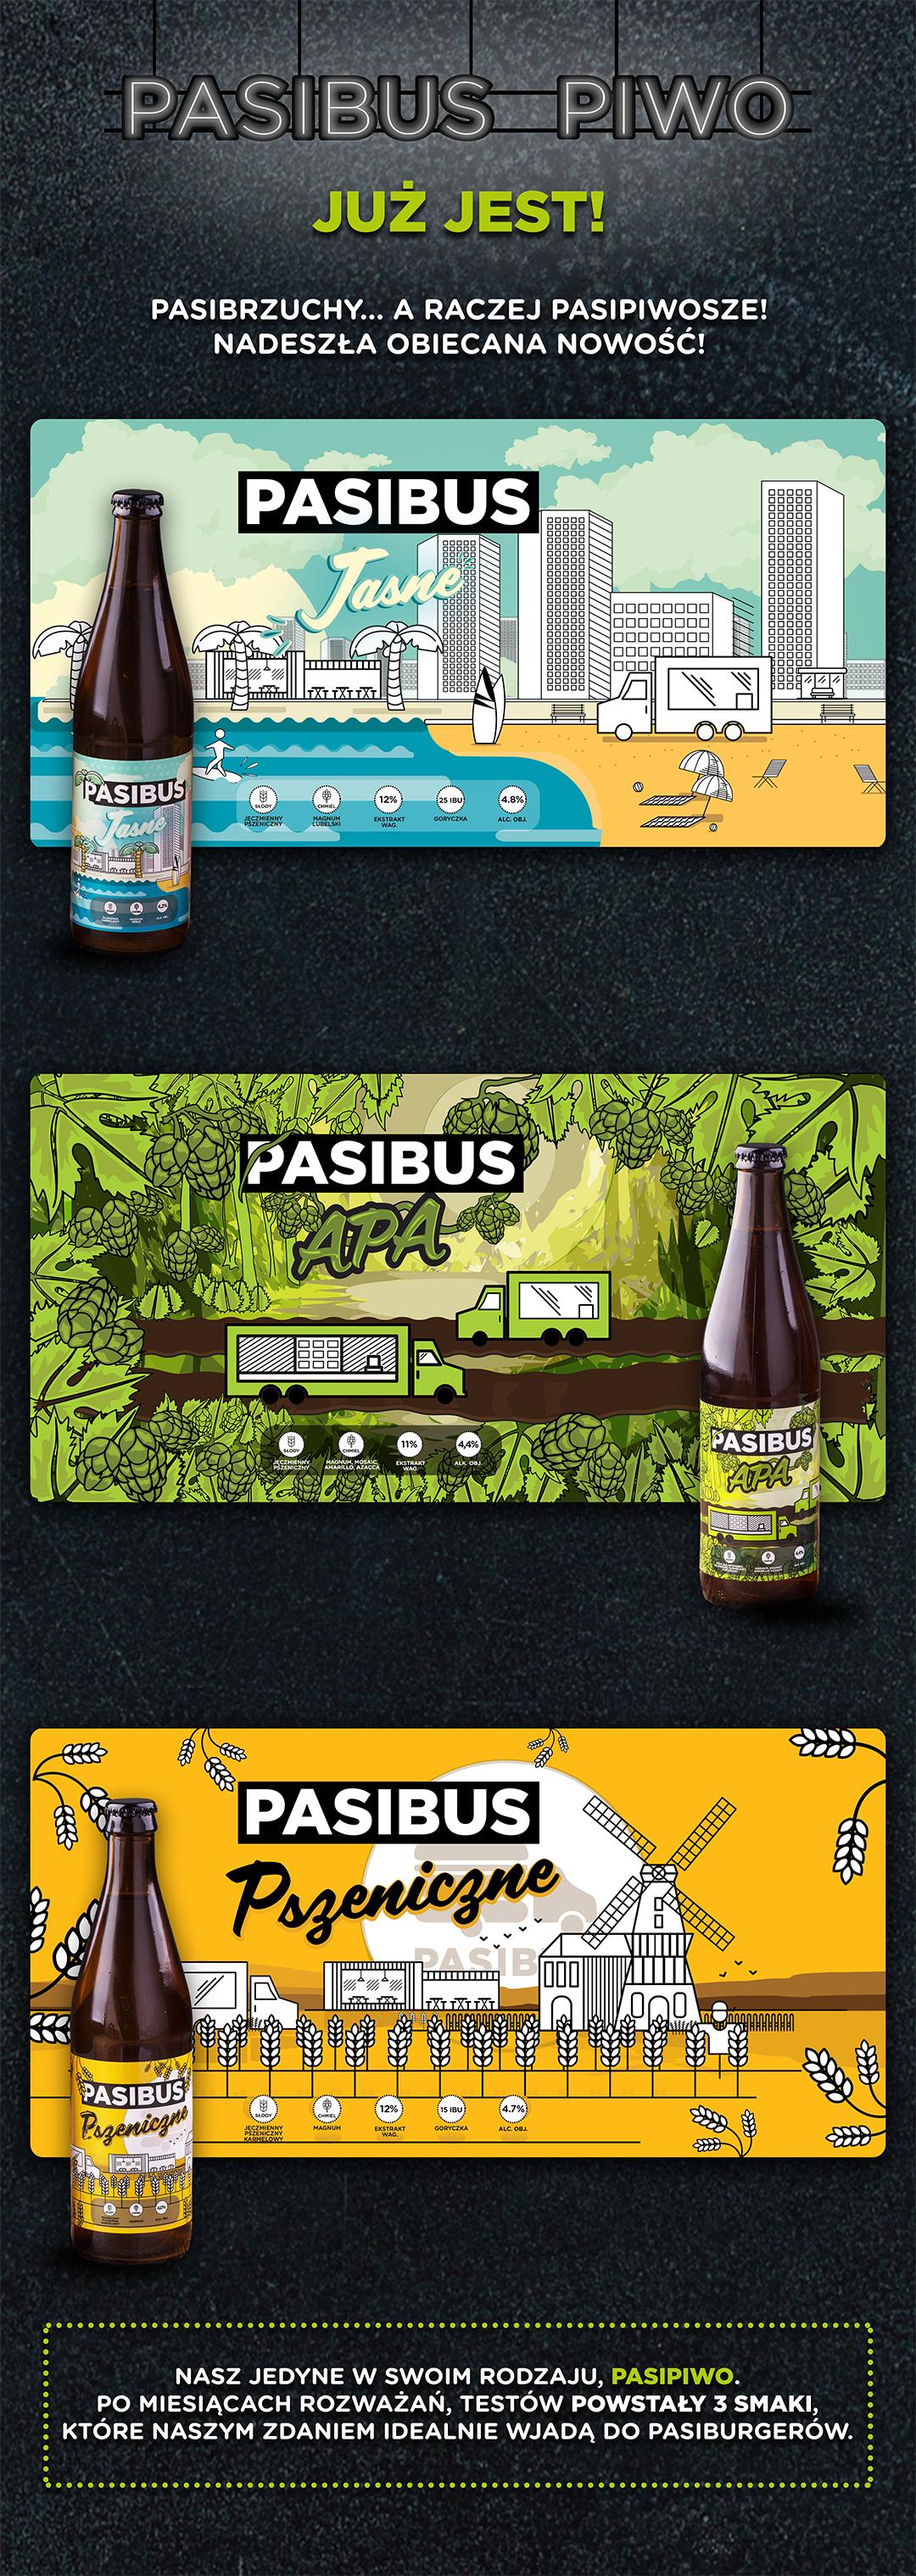 Nowość w Pasibus - piwo Pasibus już dostępne